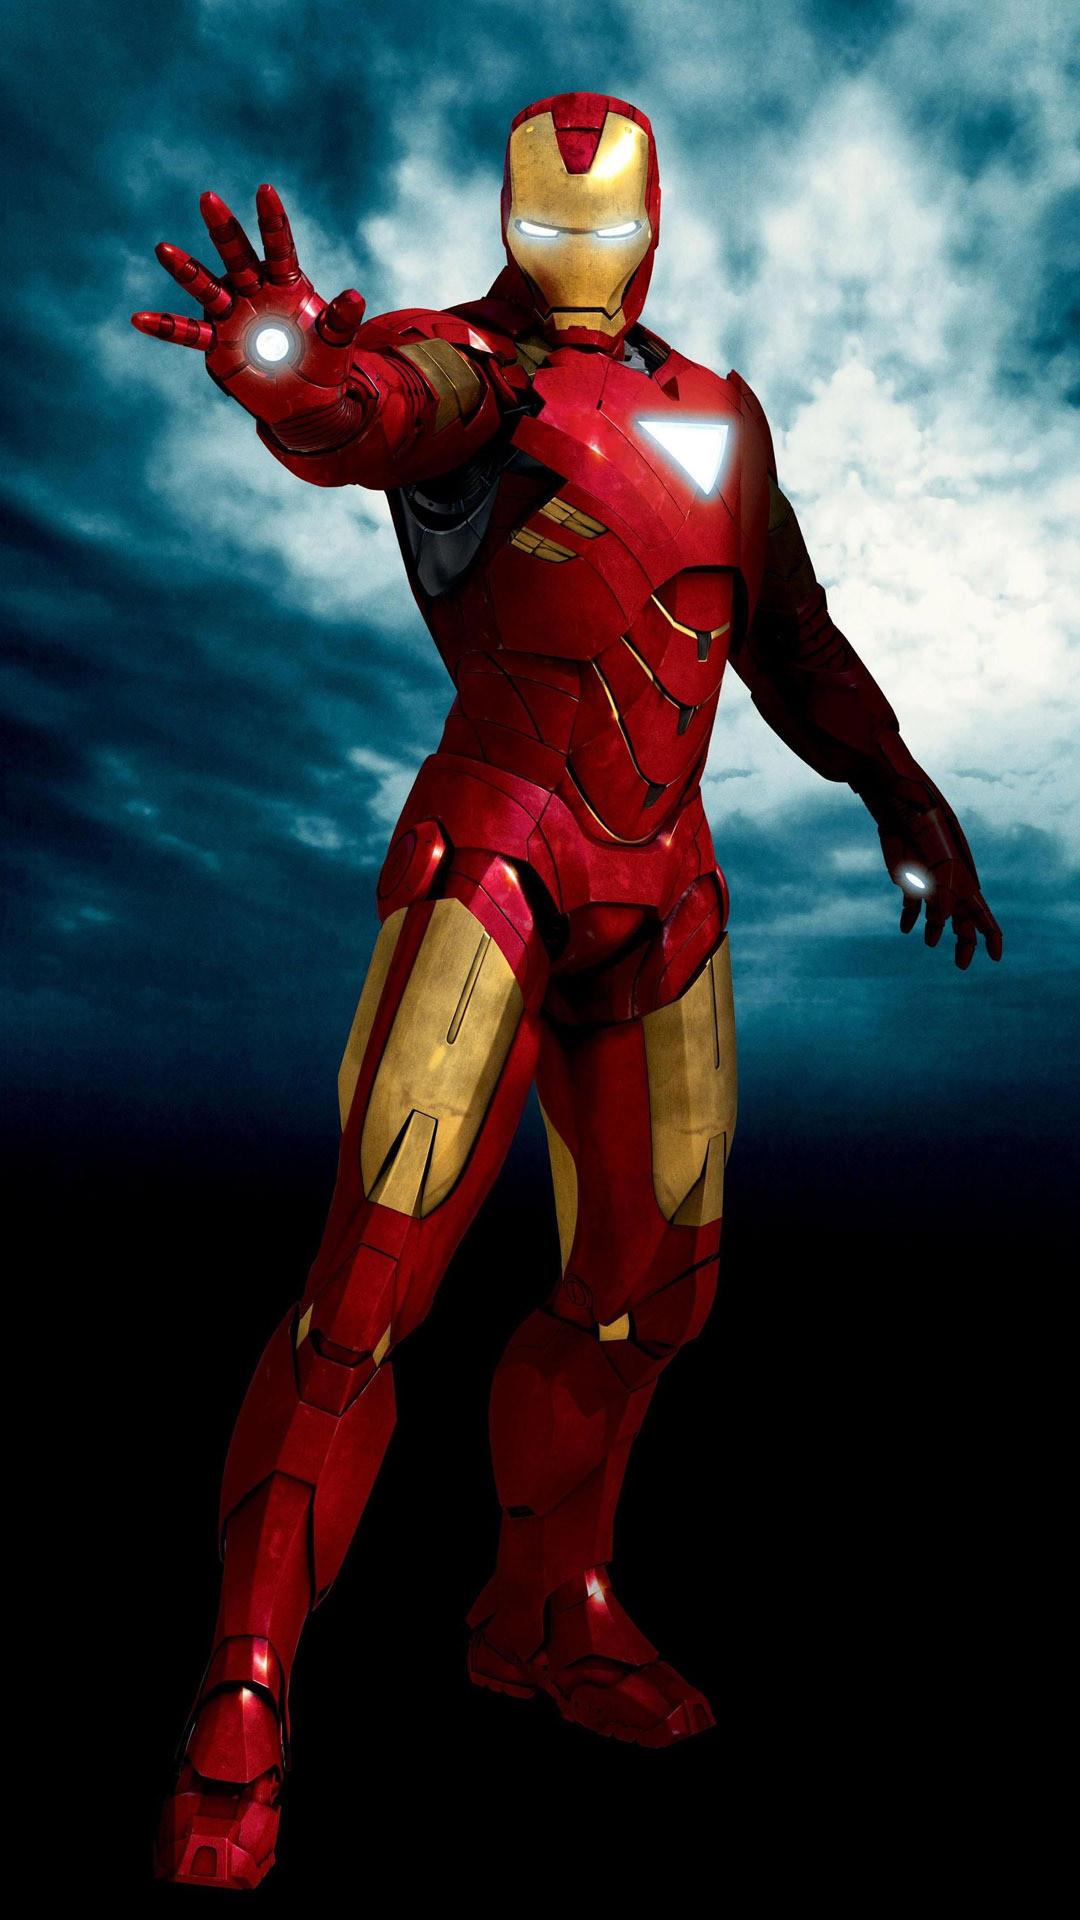 Iron Man Marvel iphone wallpapers Iron Man Marvel iphone wallpaper 2015